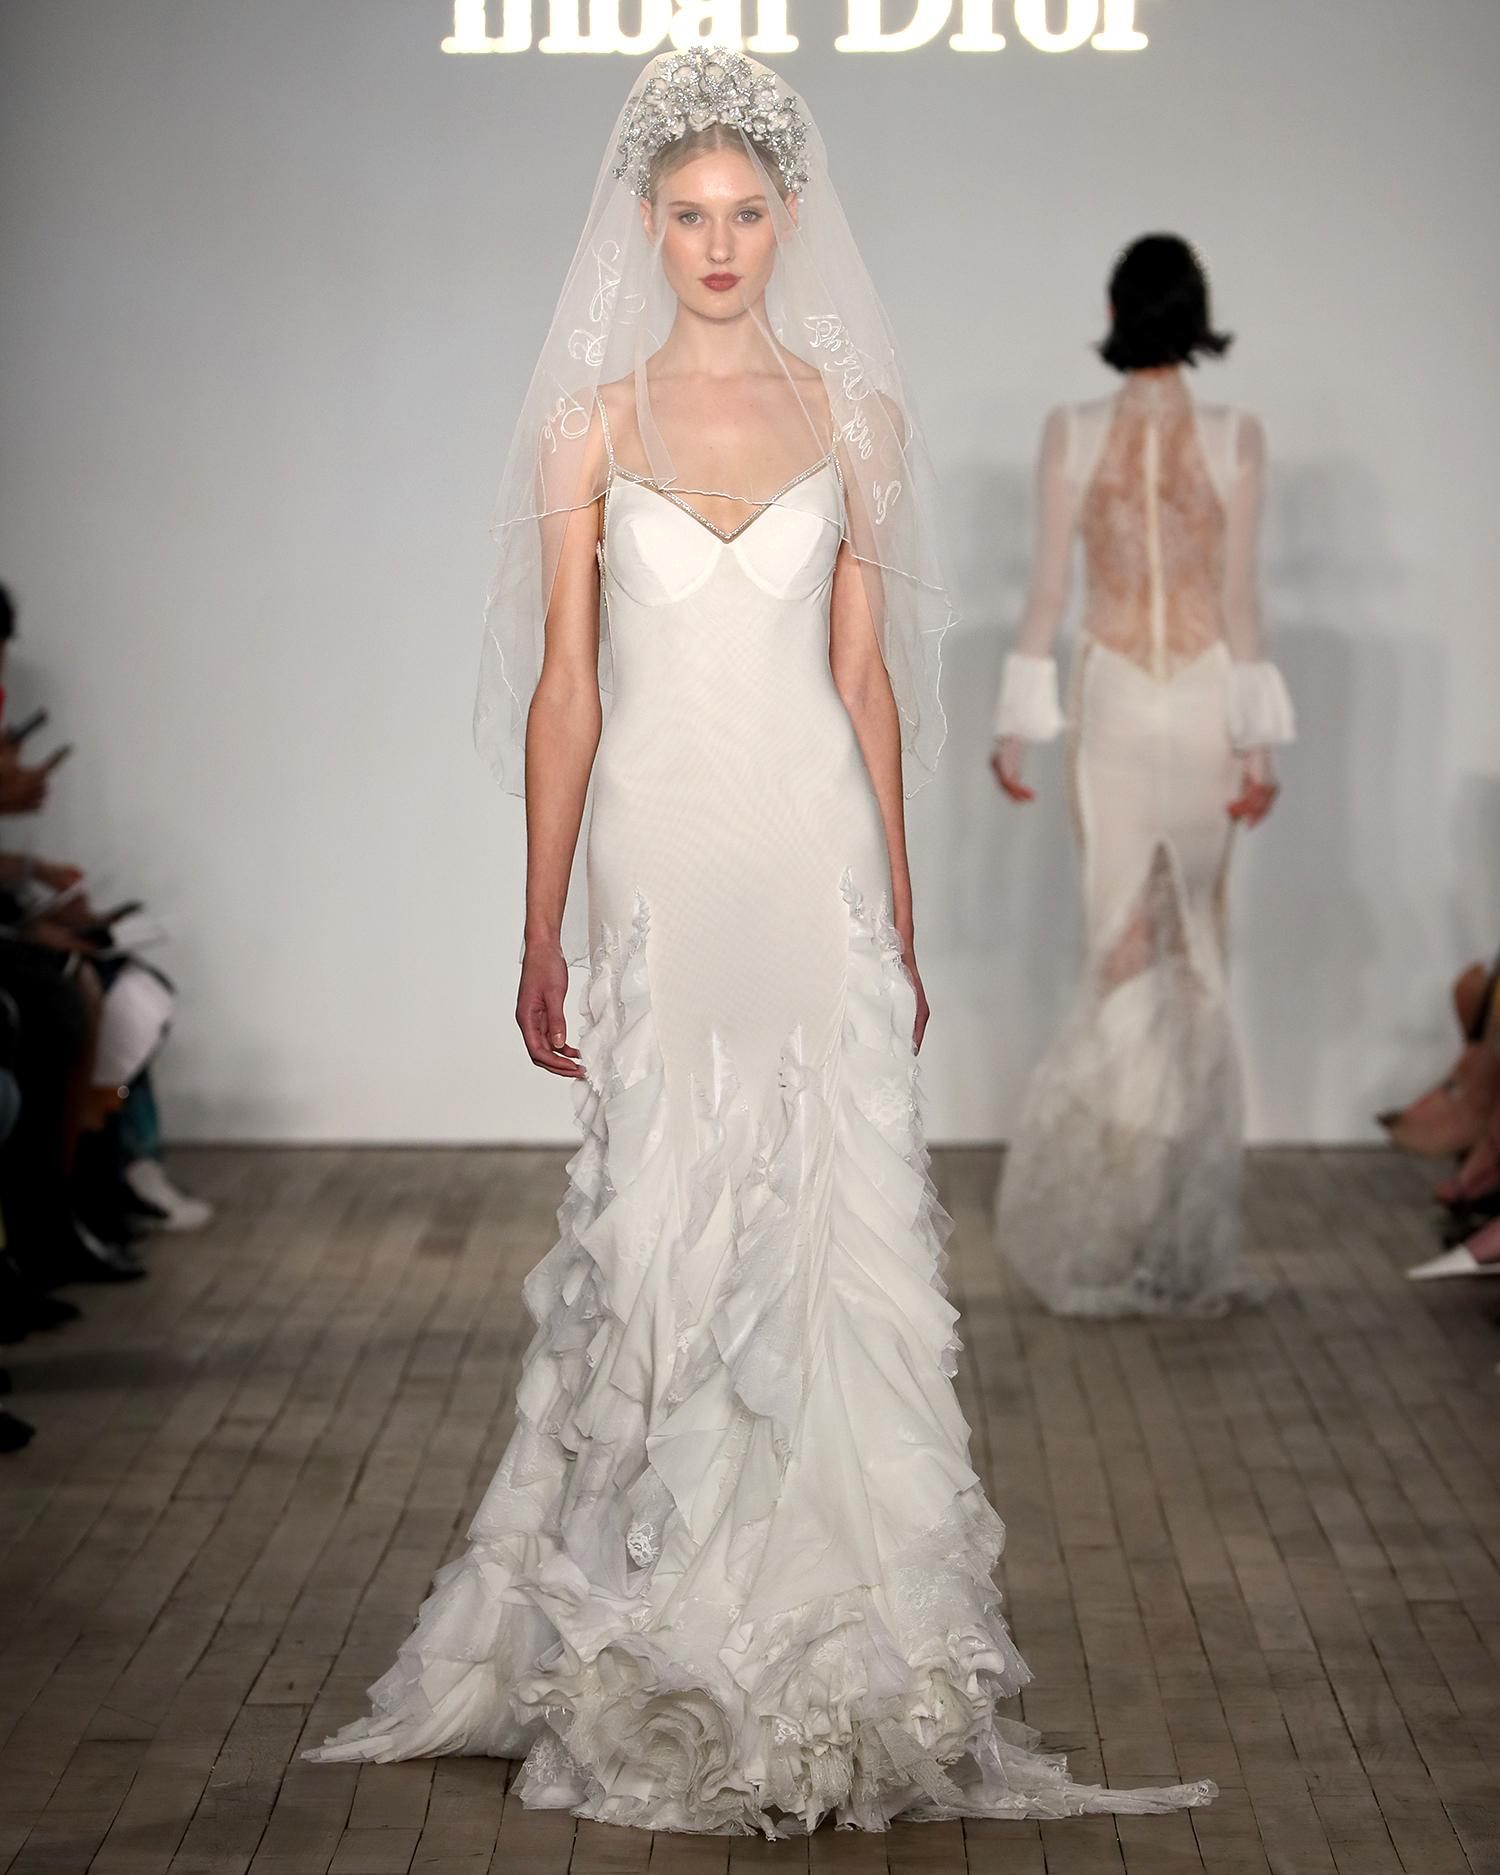 inbal dror wedding dress spaghetti-strap sheath with vertical ruffles